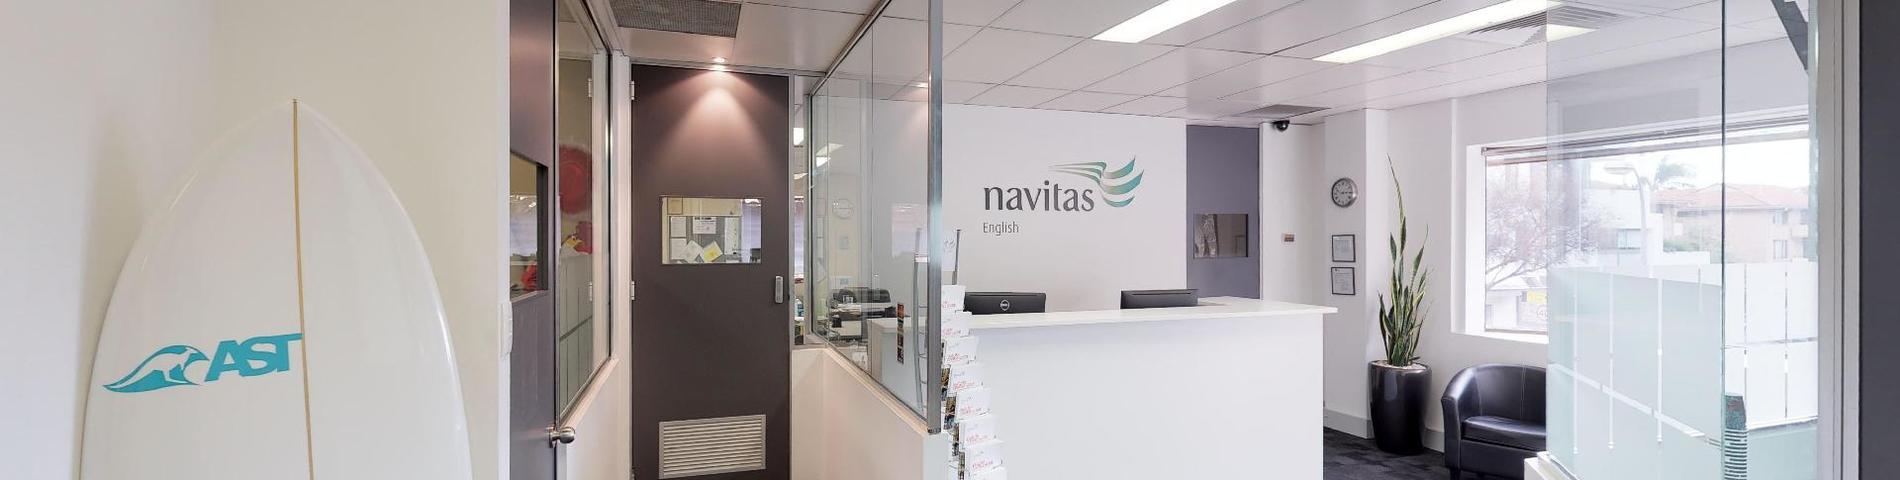 Navitas English picture 1